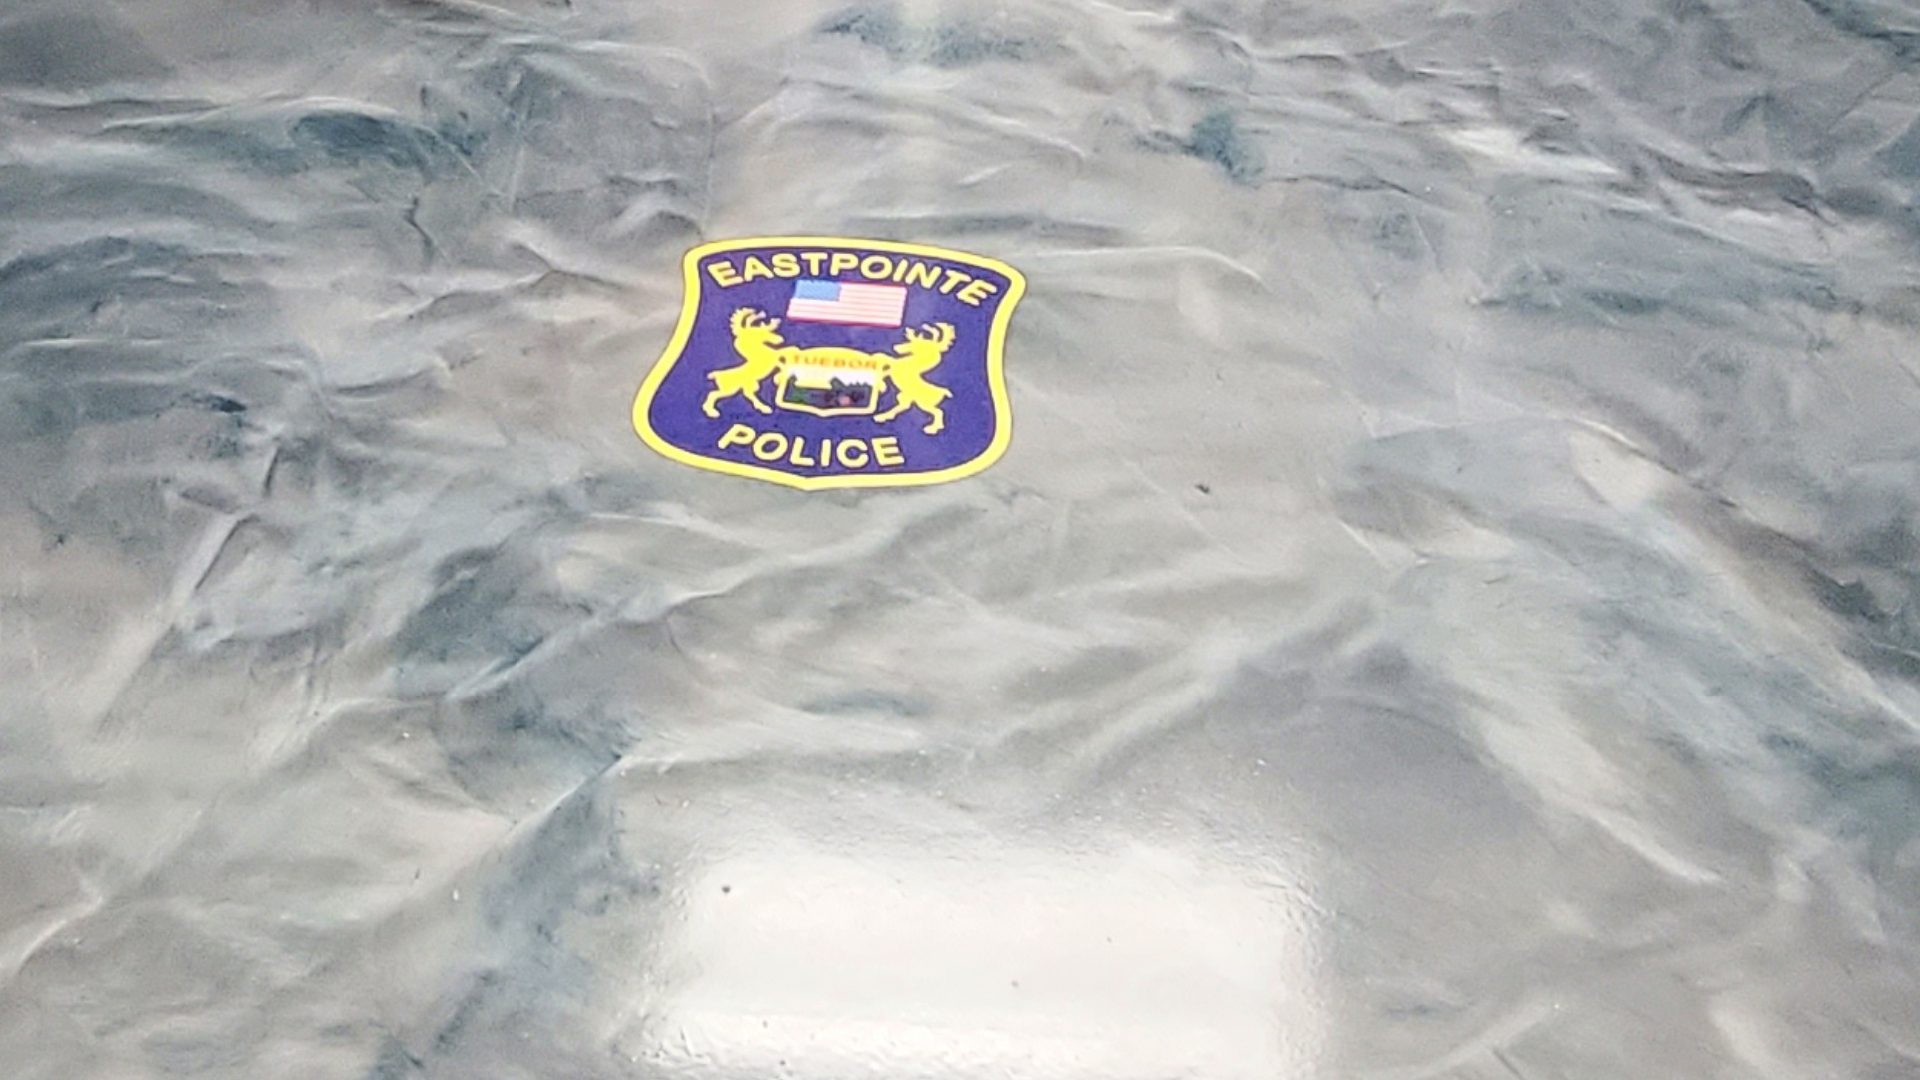 Eastpointe Police - Lobby Signage (4)